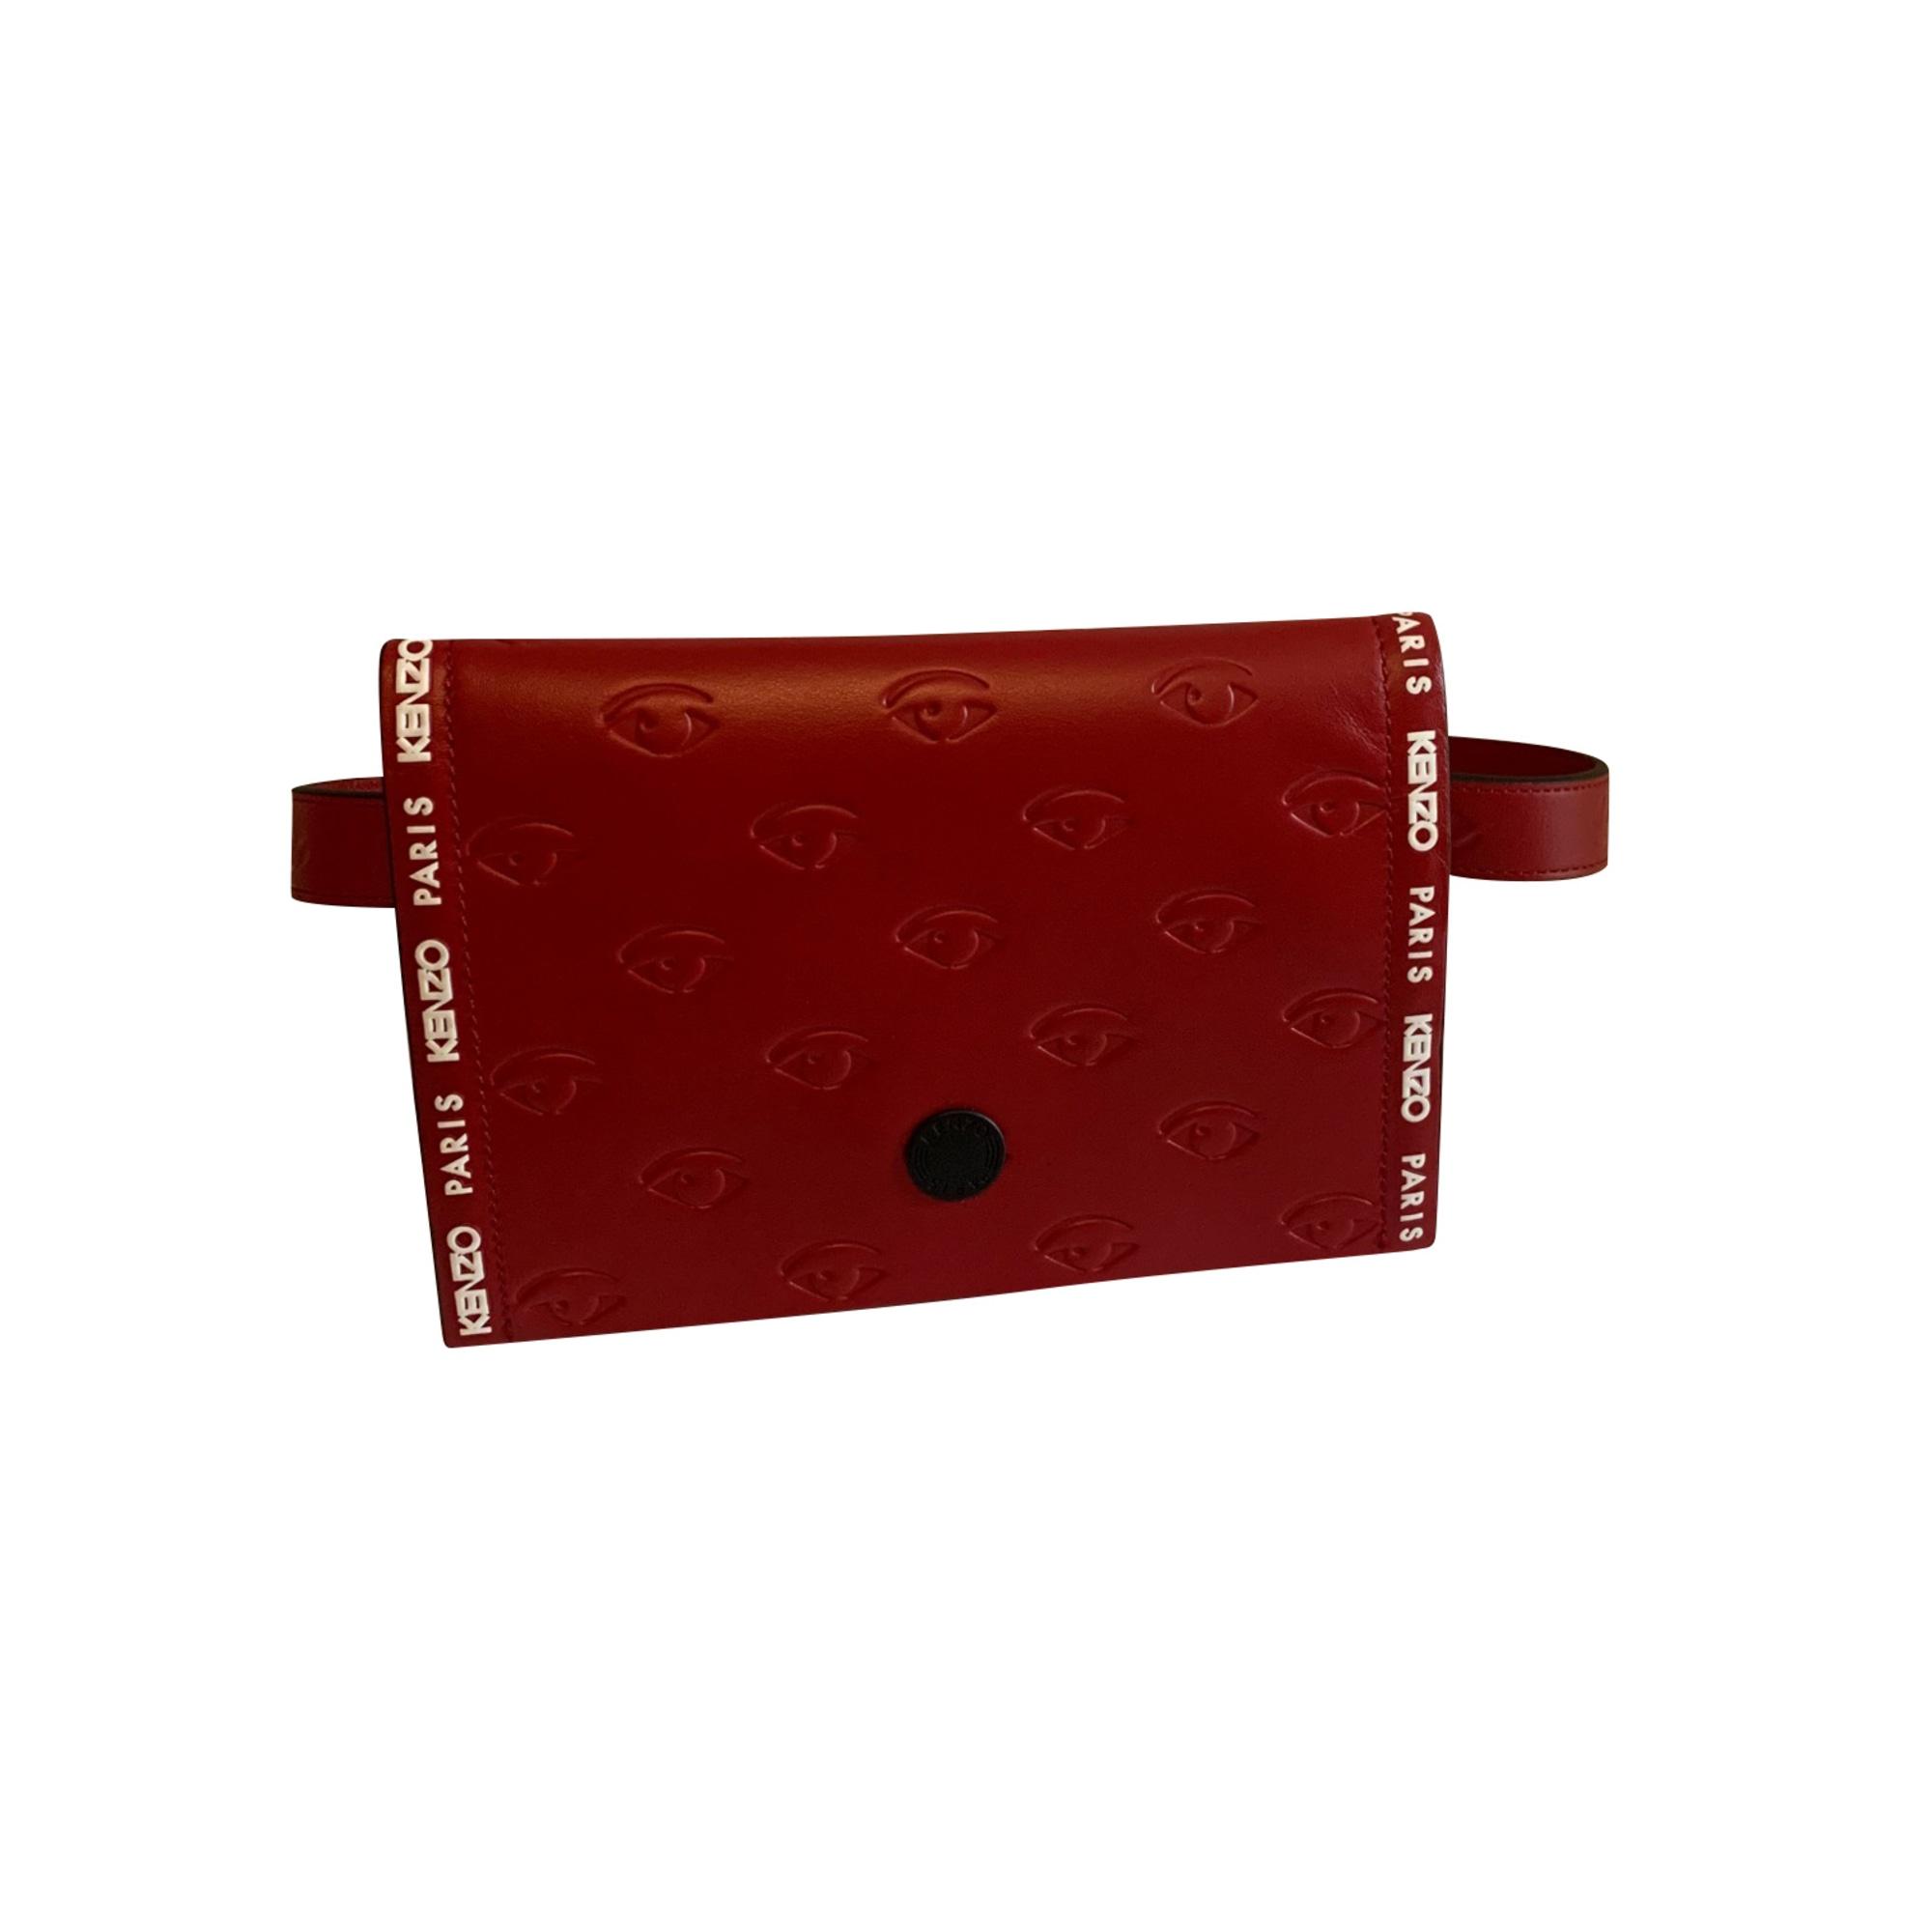 Lederhandtasche KENZO Rot, bordeauxrot